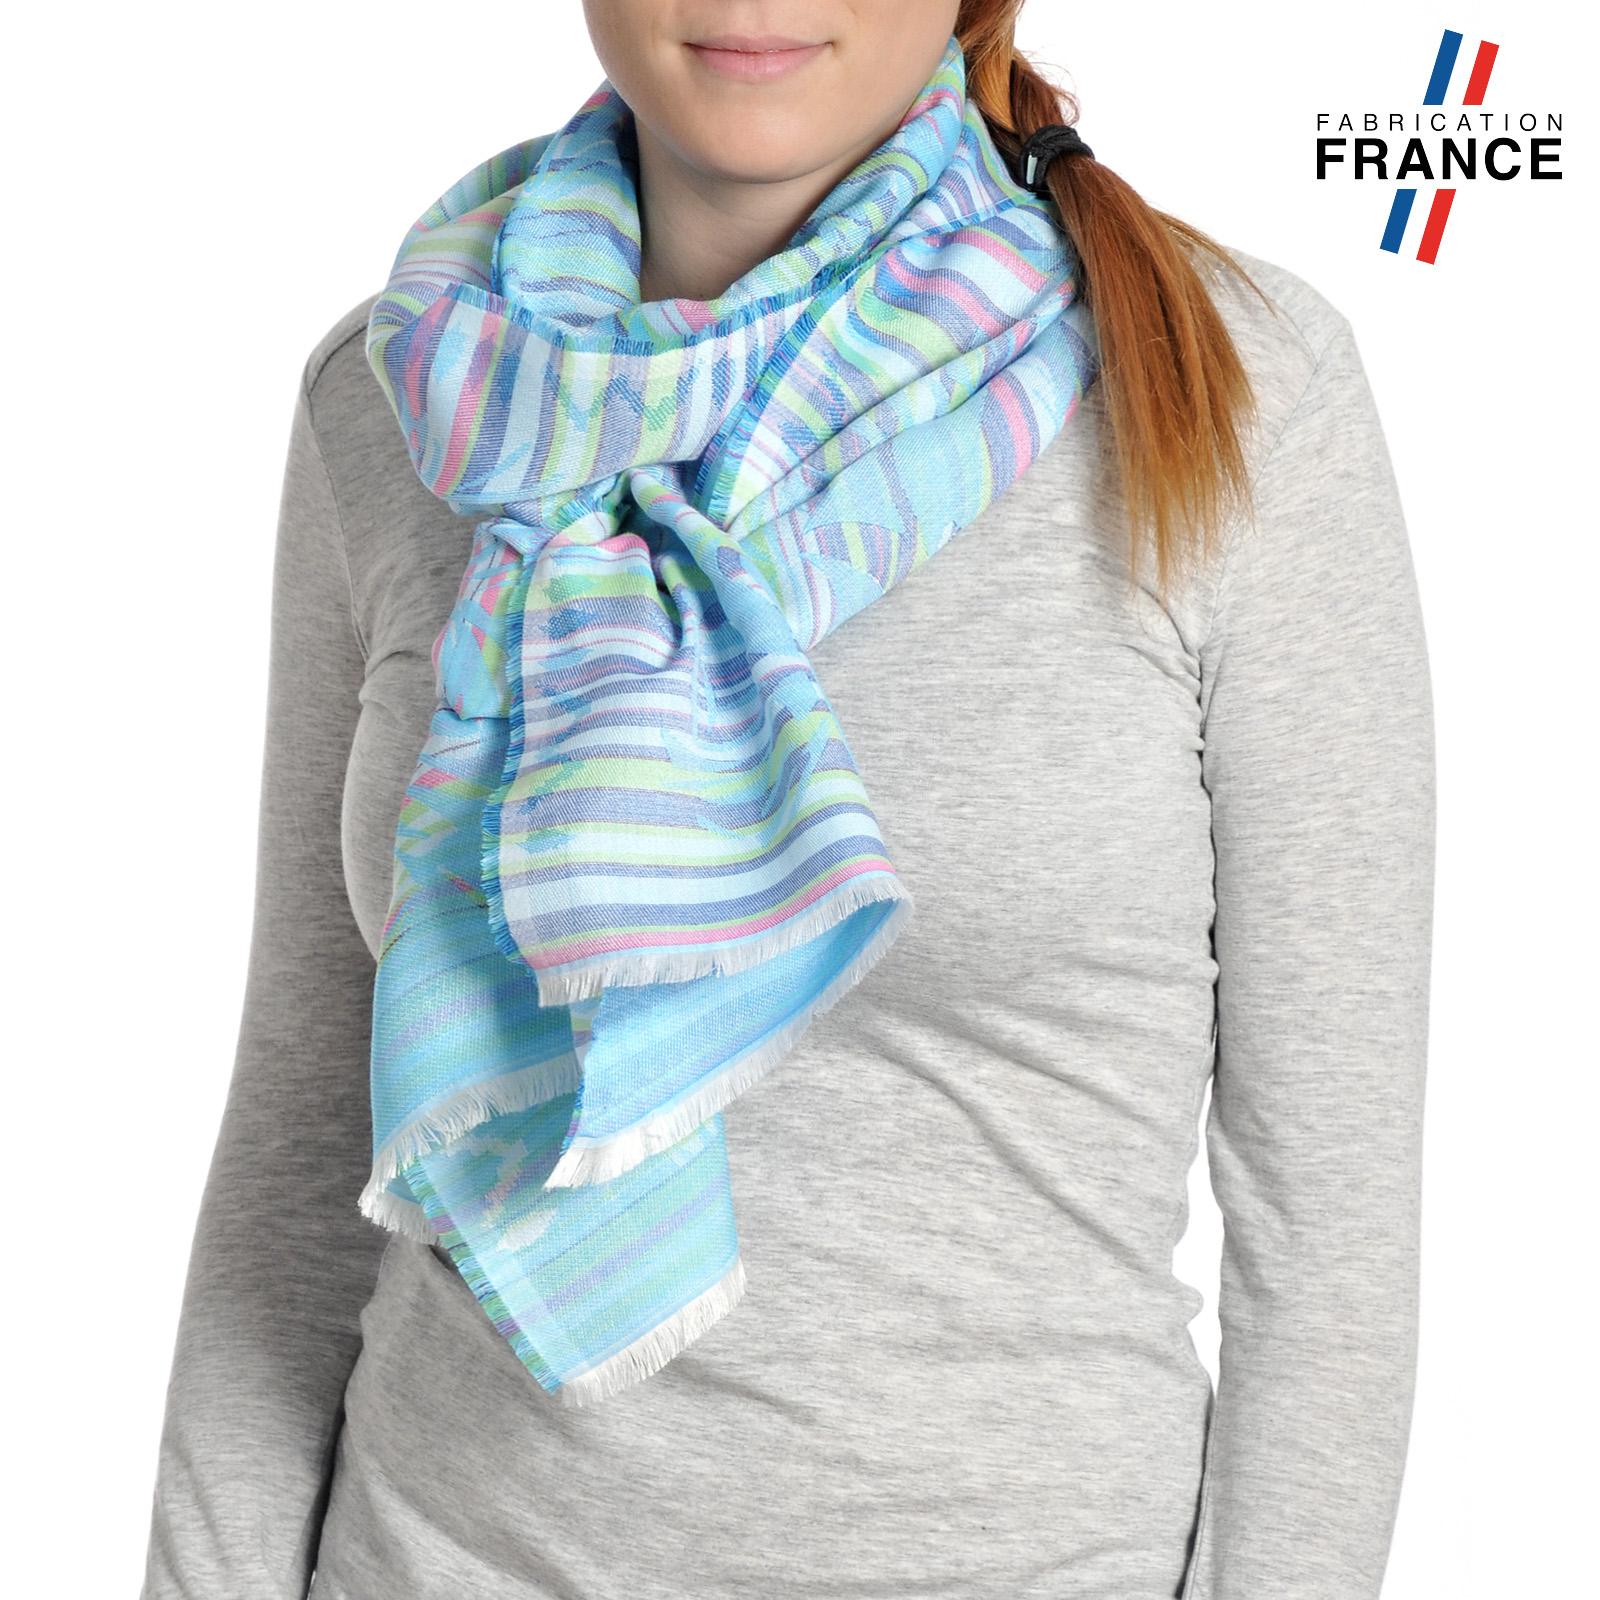 AT-04210-VF16-P-LB_FR-echarpe-legere-rayures-fougeres-bleue-qualicoq